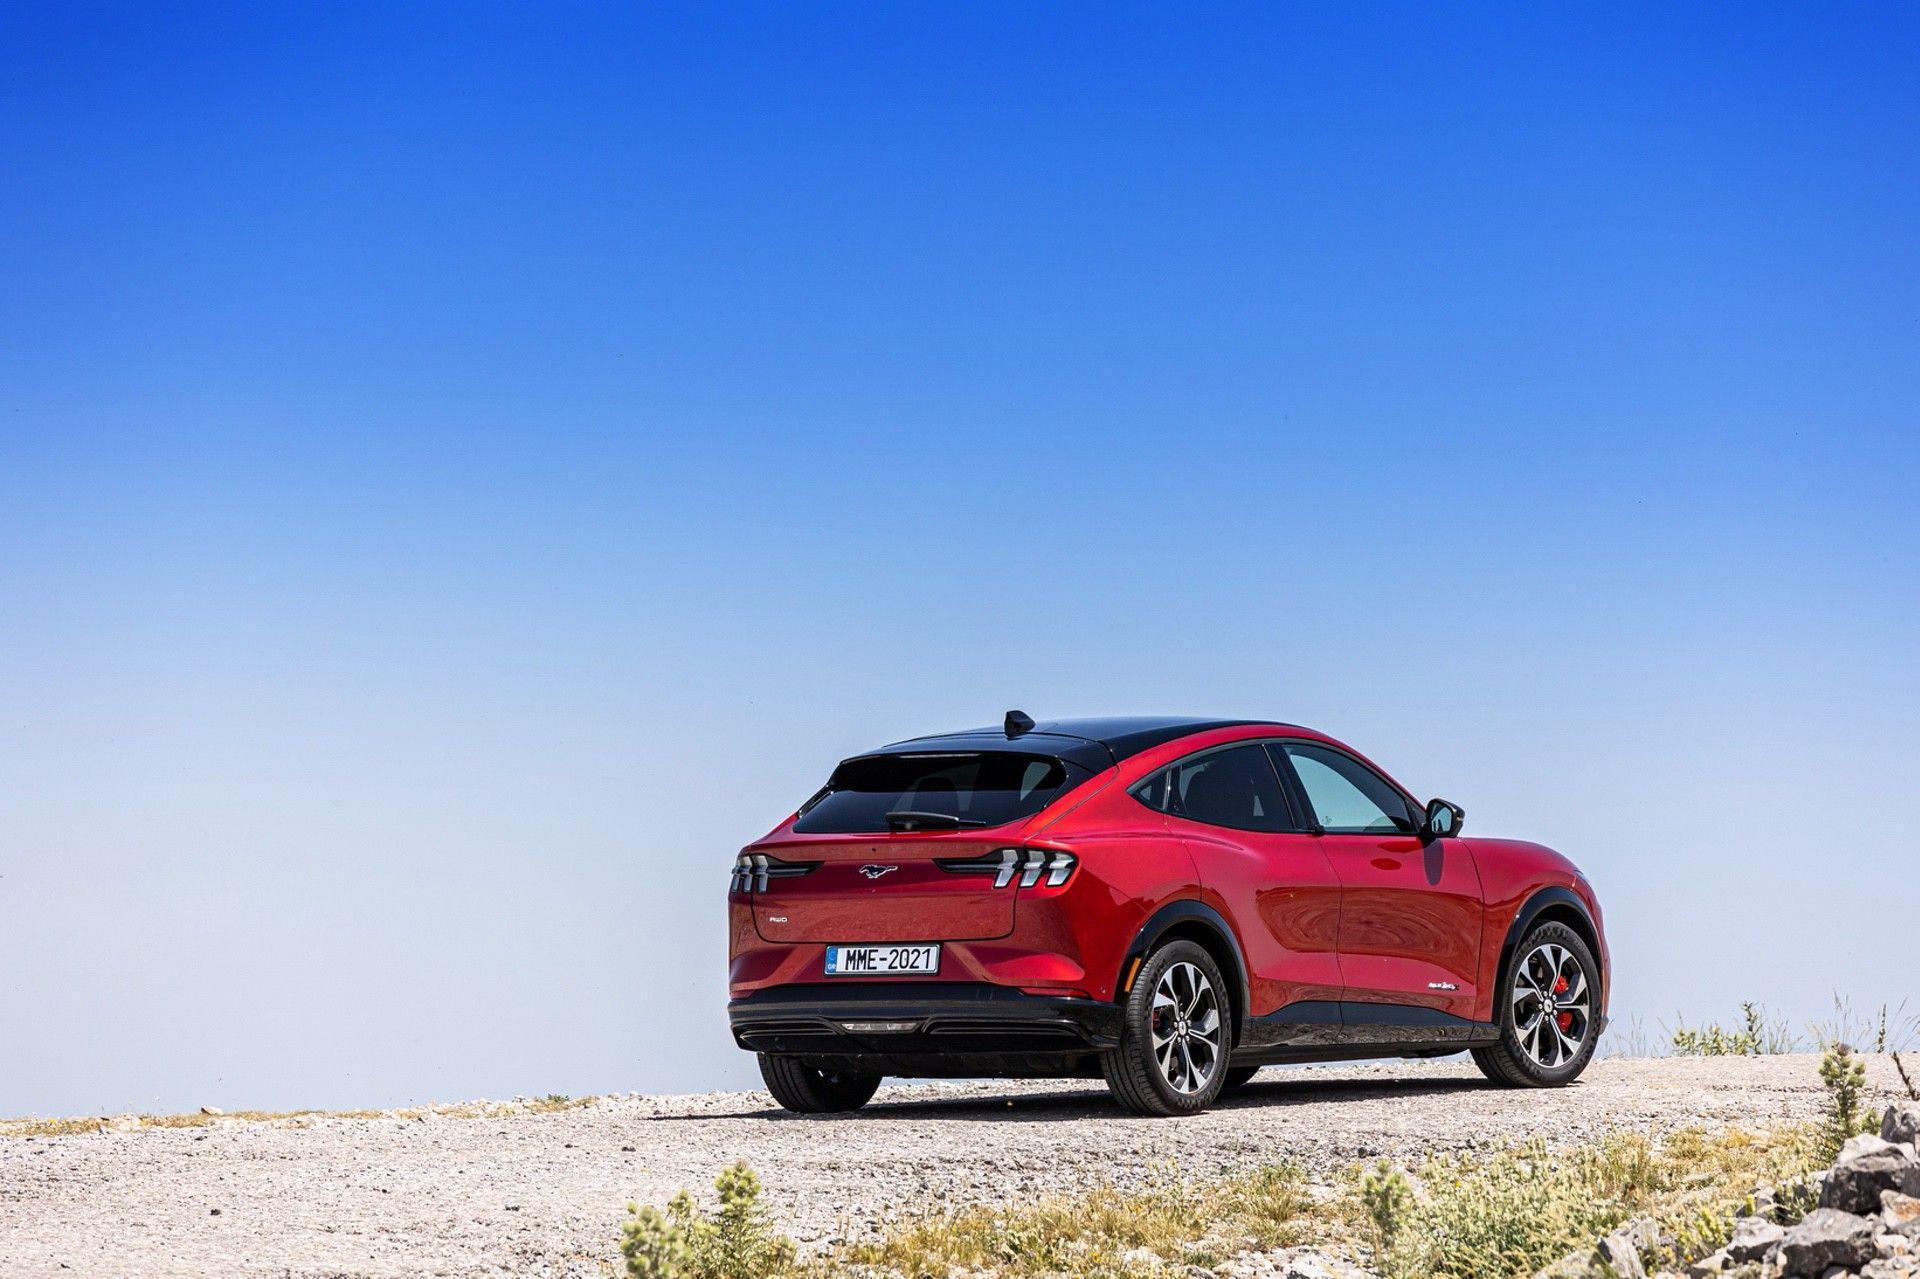 Ford_Mustang_Mach-E_greek_presskit-0055